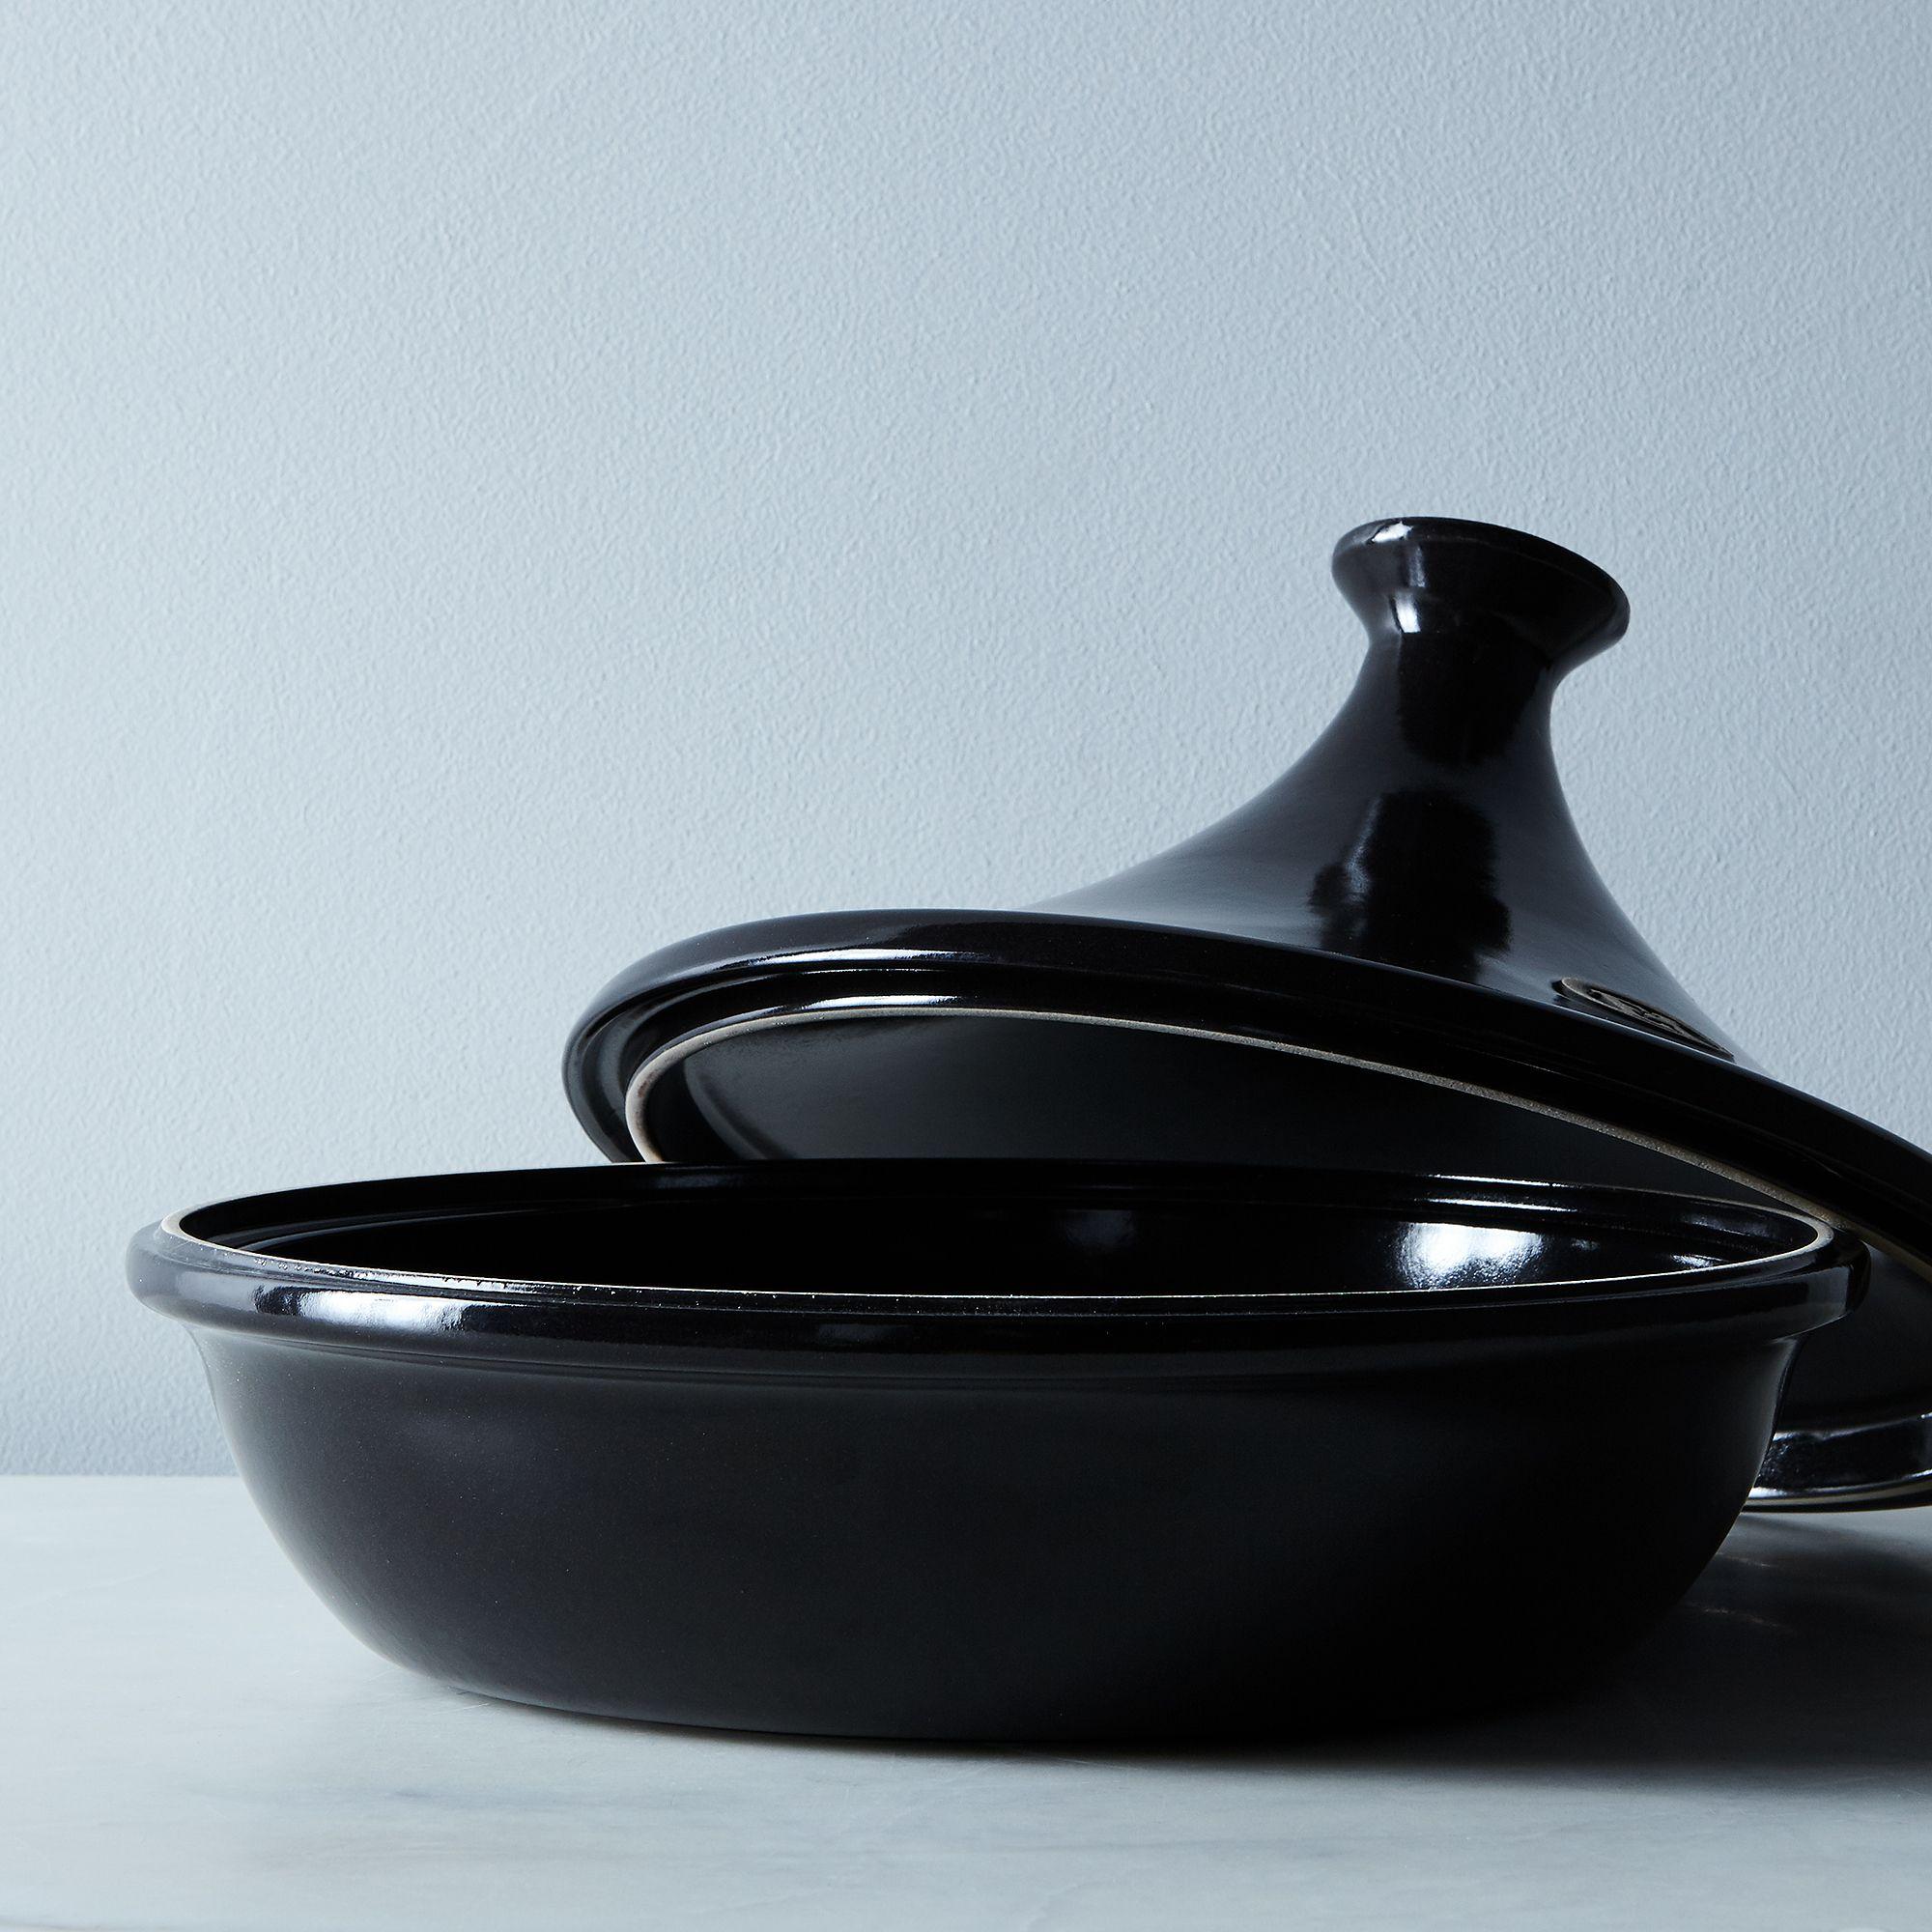 Emile Henry Ceramic Tagine on Food52